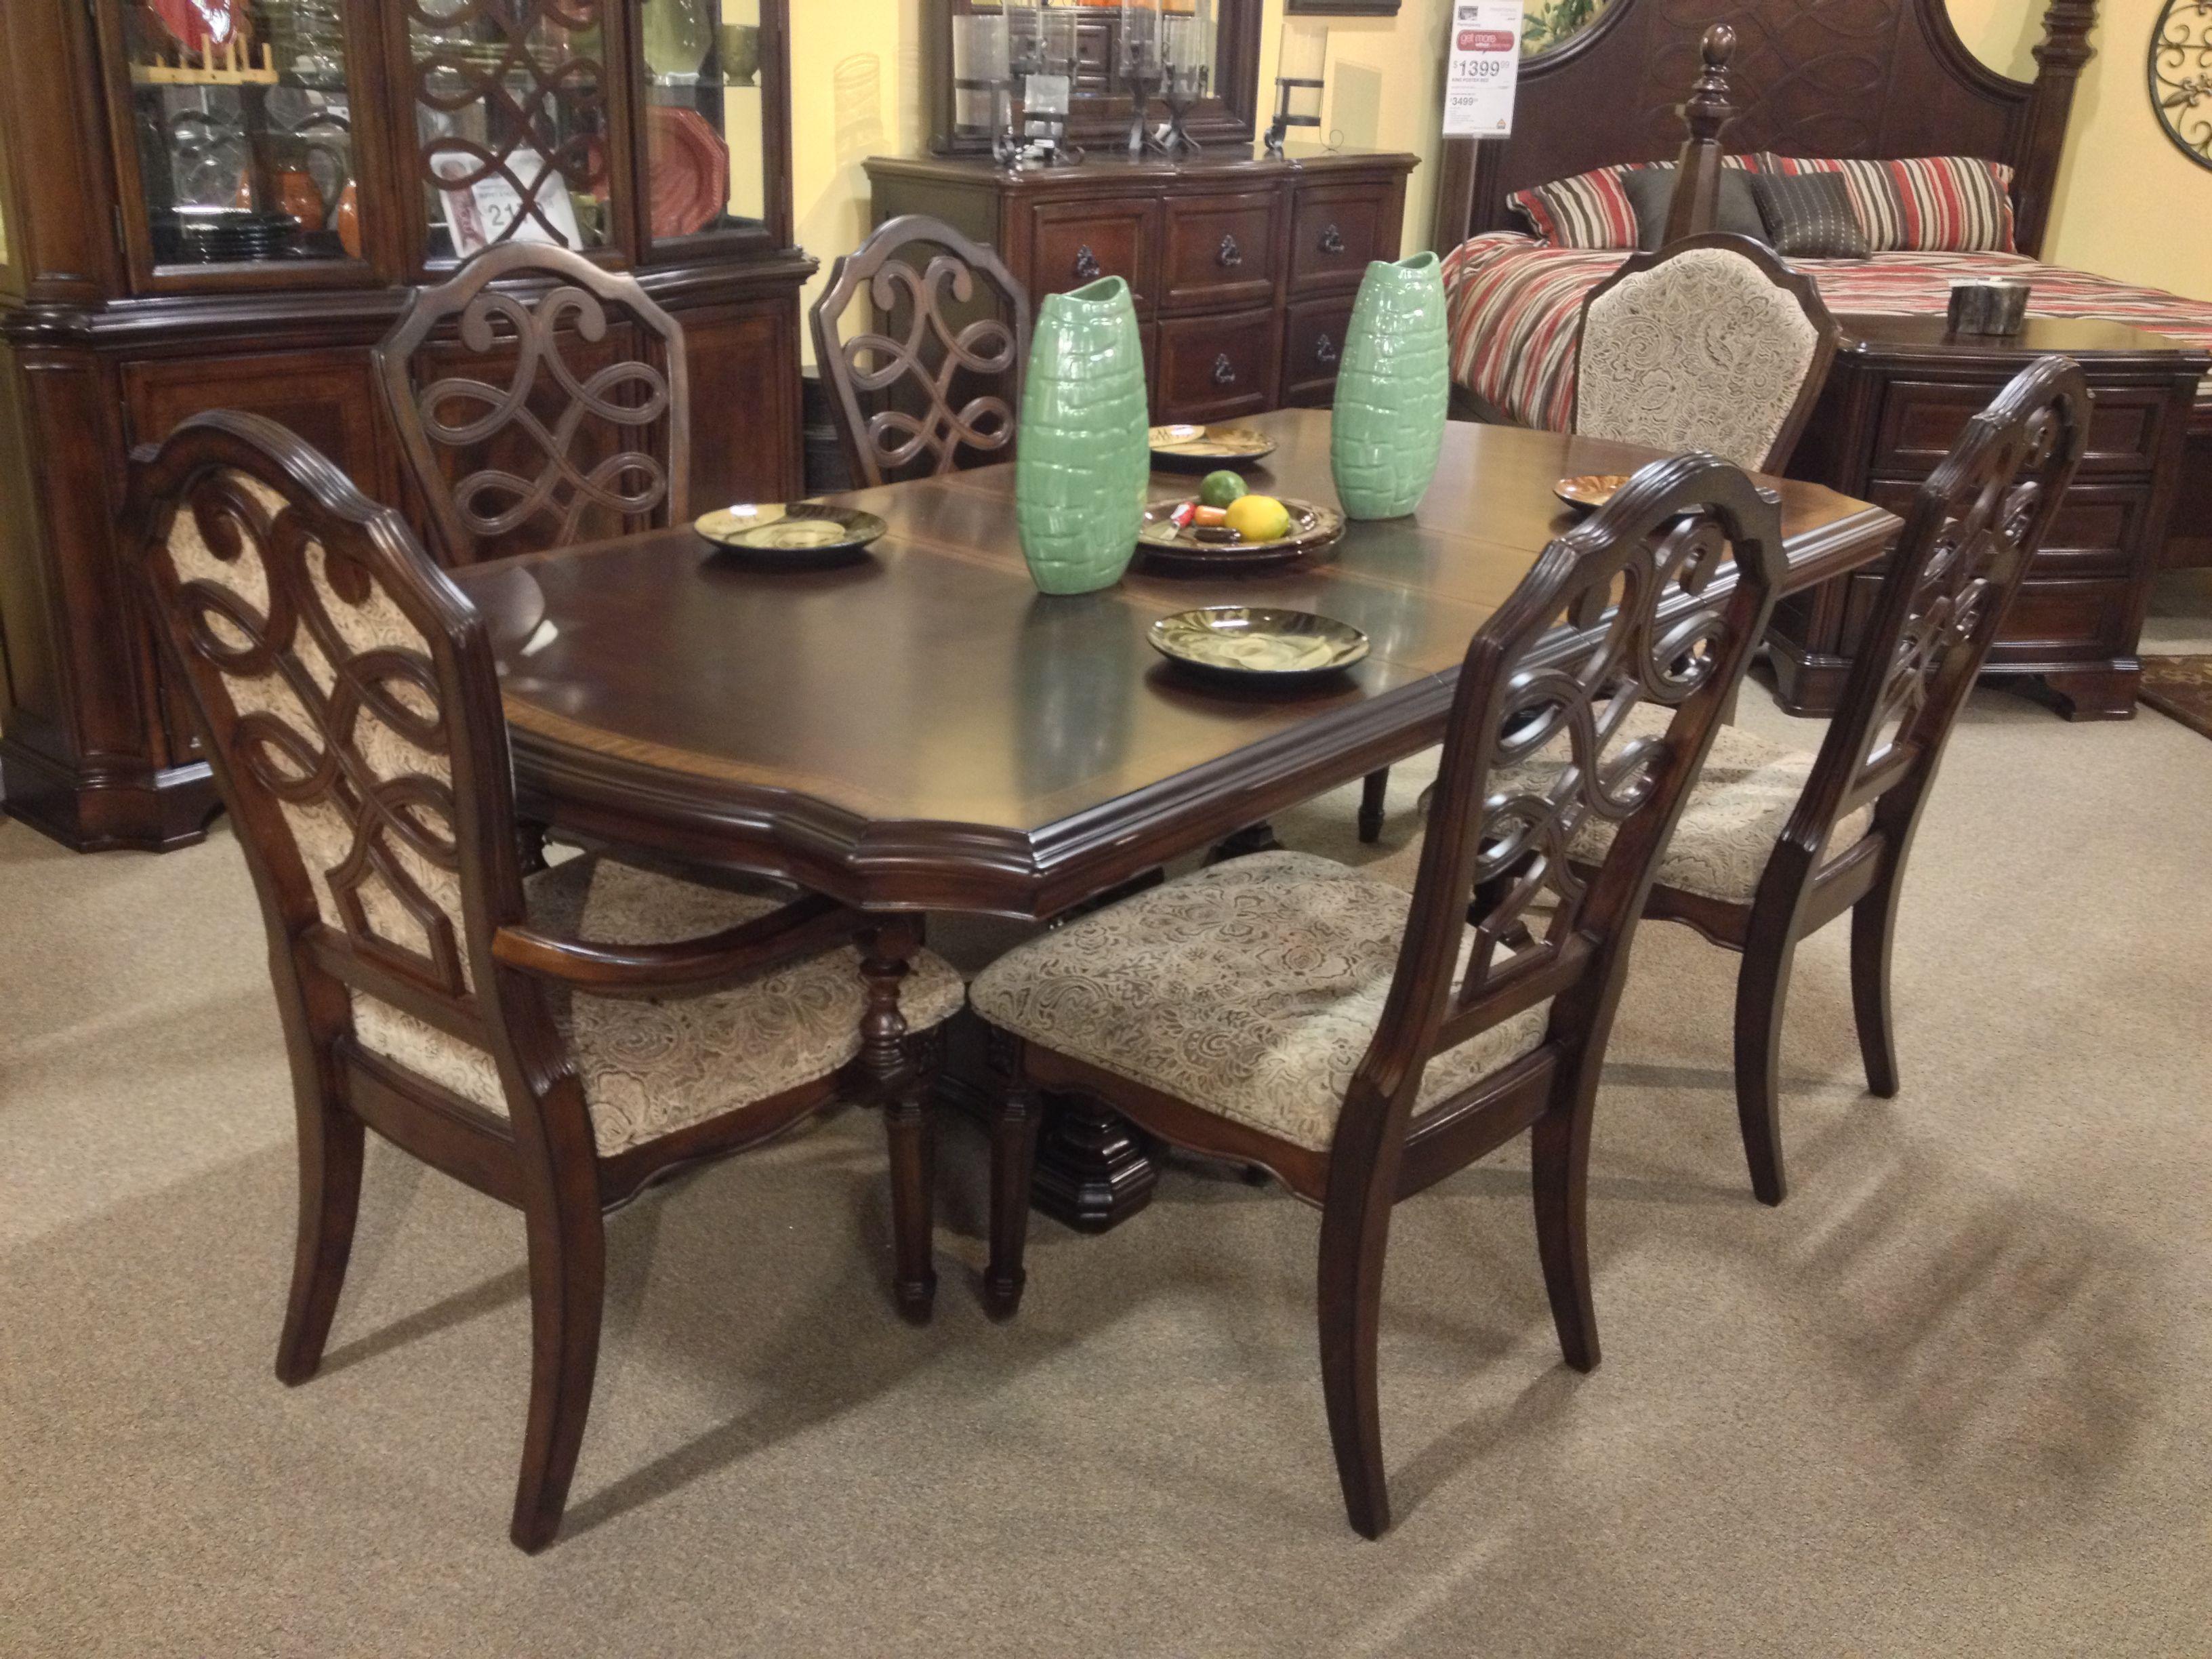 Flemingsburg 7 Piece Dining Room Set Ashley Furniture In